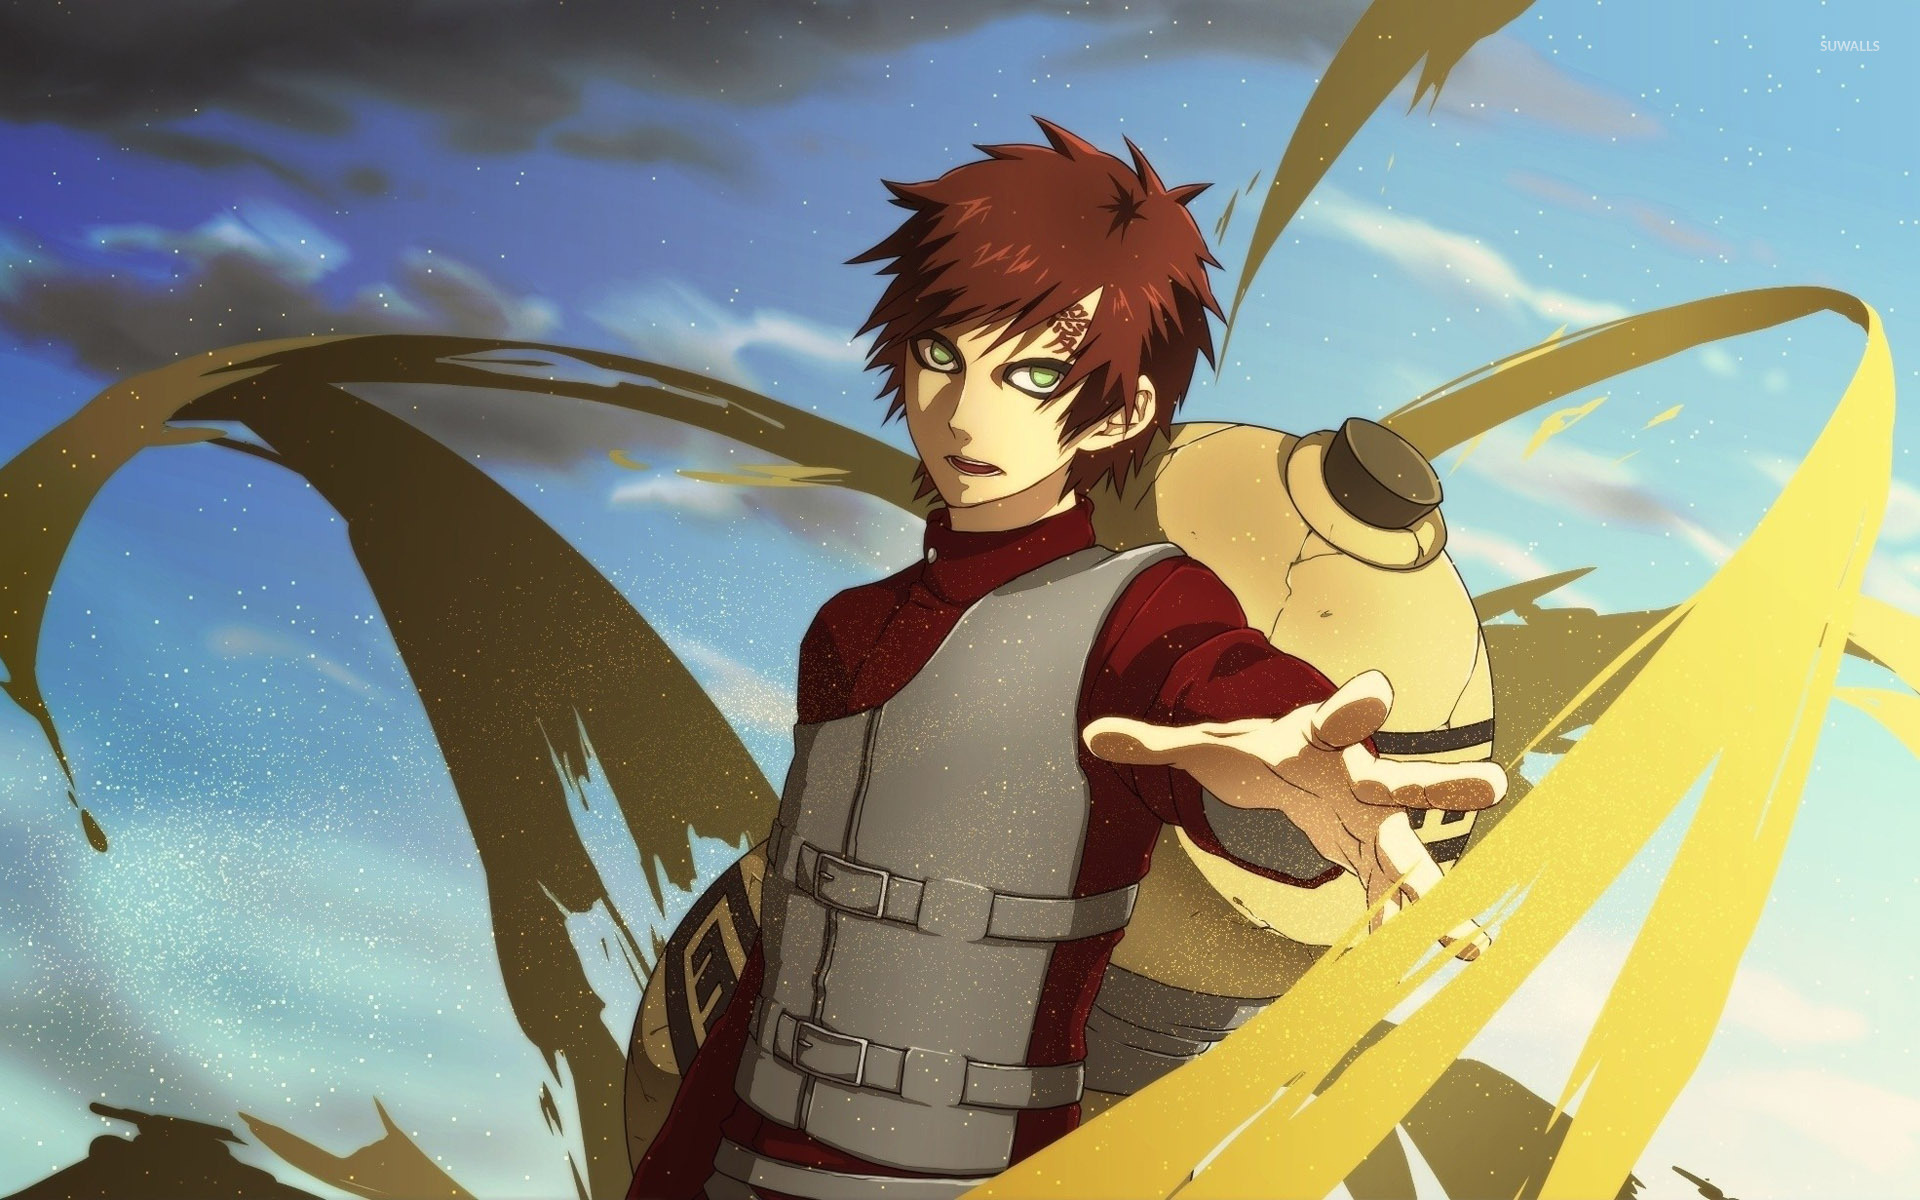 Gaara - Naruto [2] wallpaper - Anime wallpapers - #30304